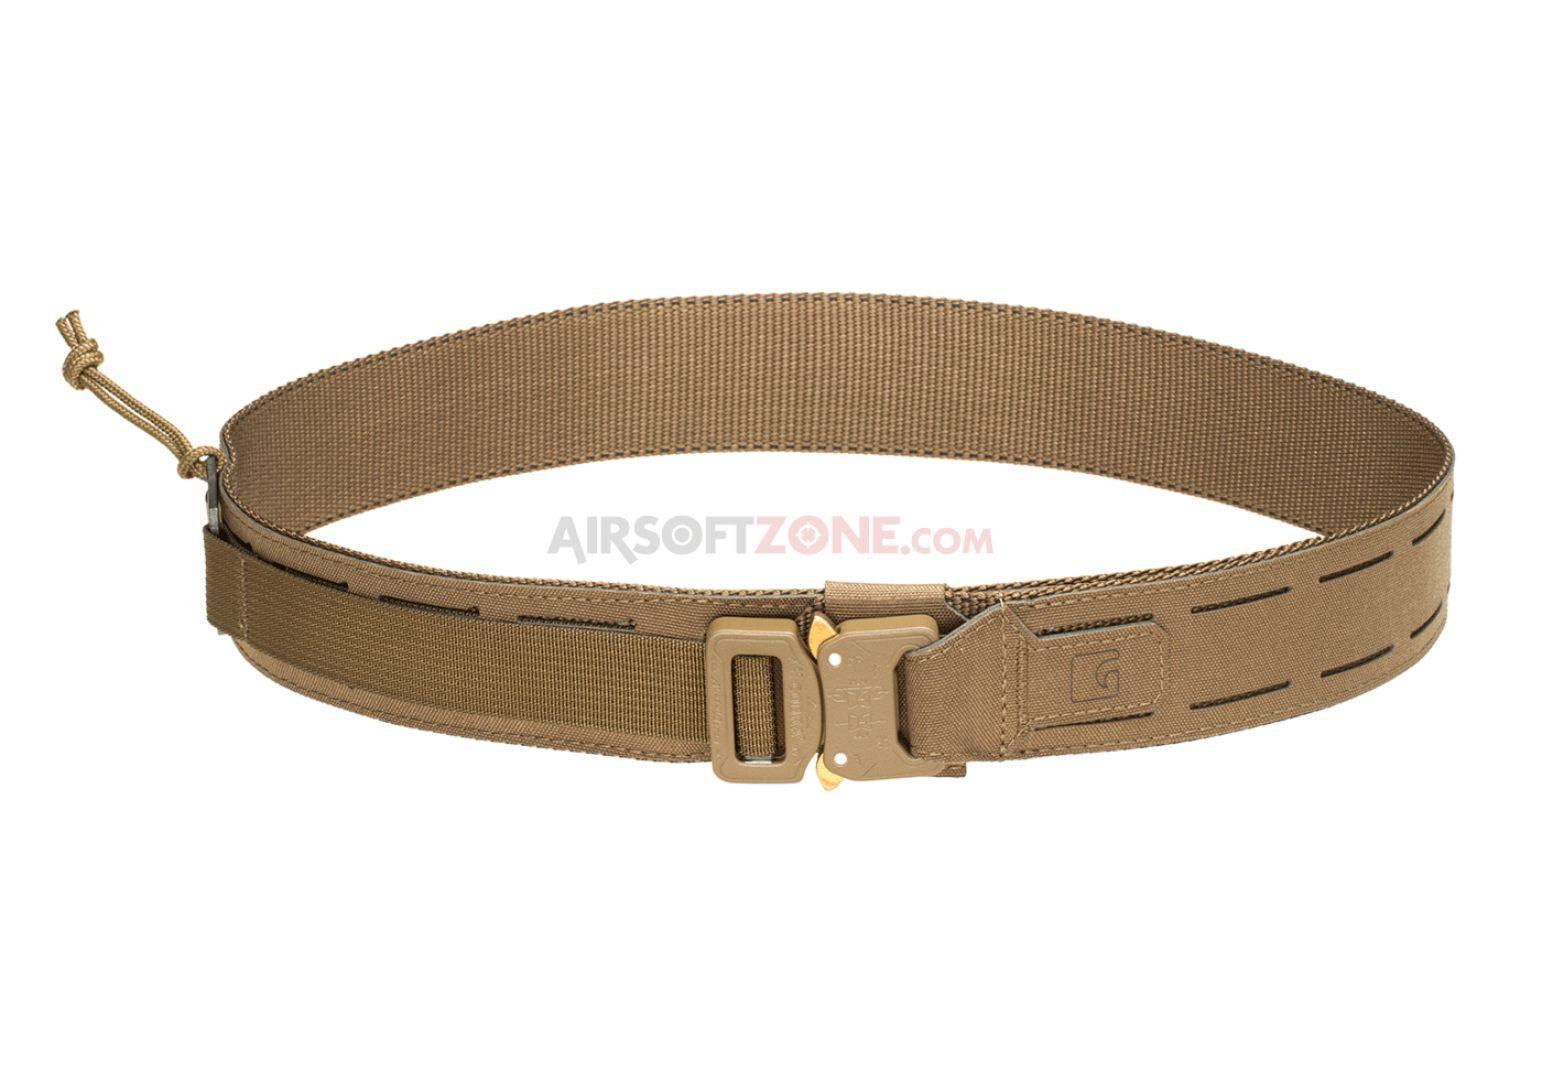 Cintura KD one belt Coyote